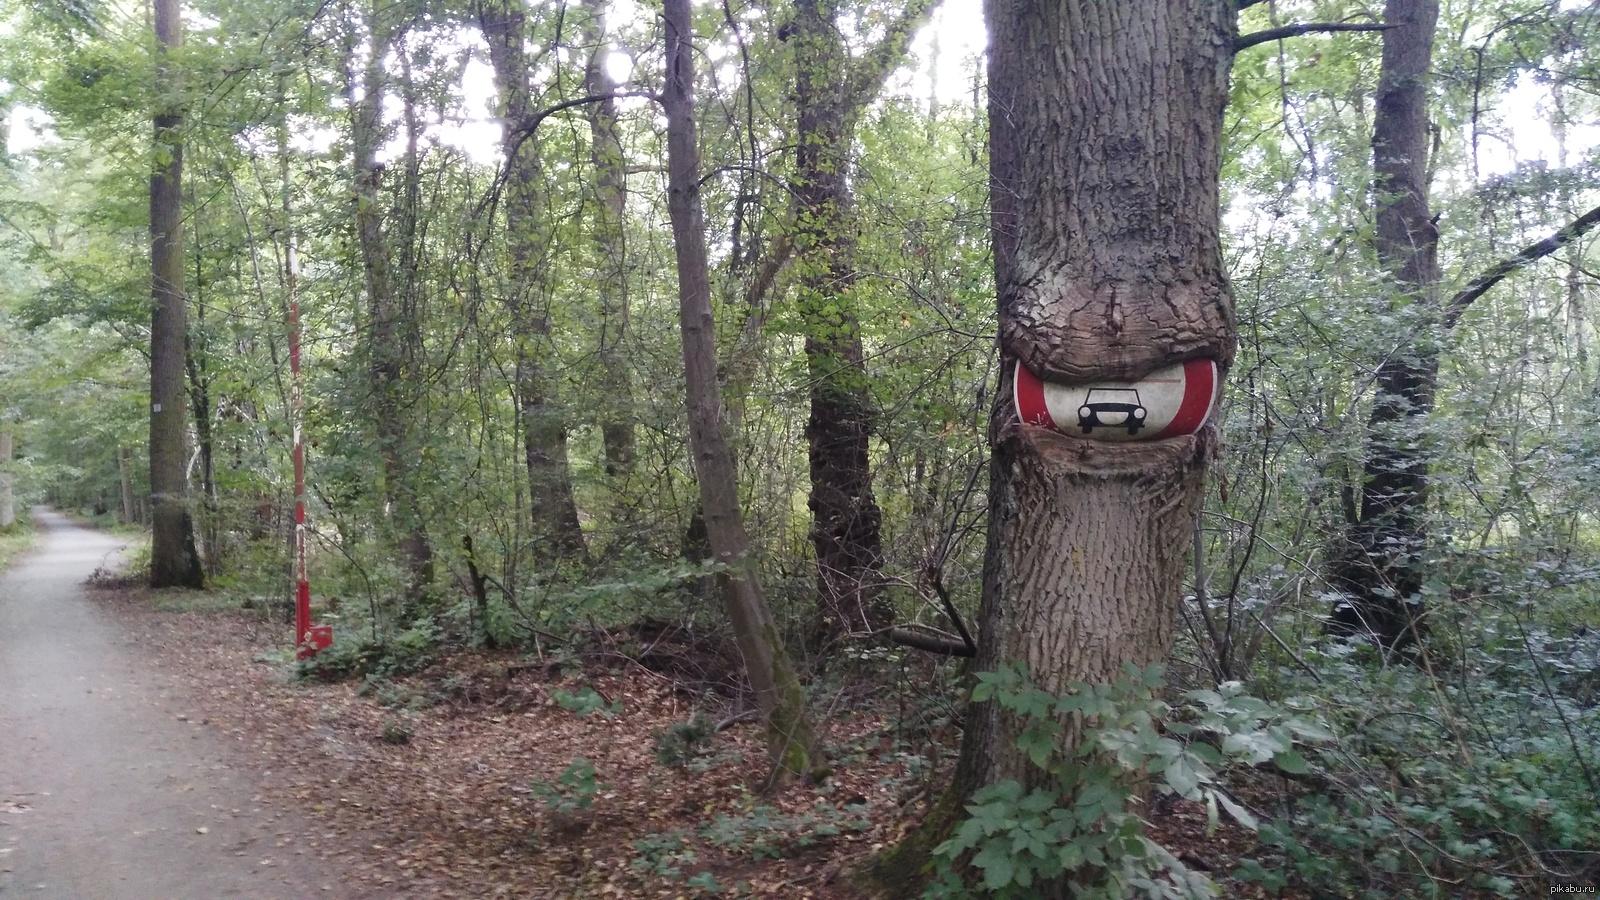 Картинки и приколы про лес, надписью желаю